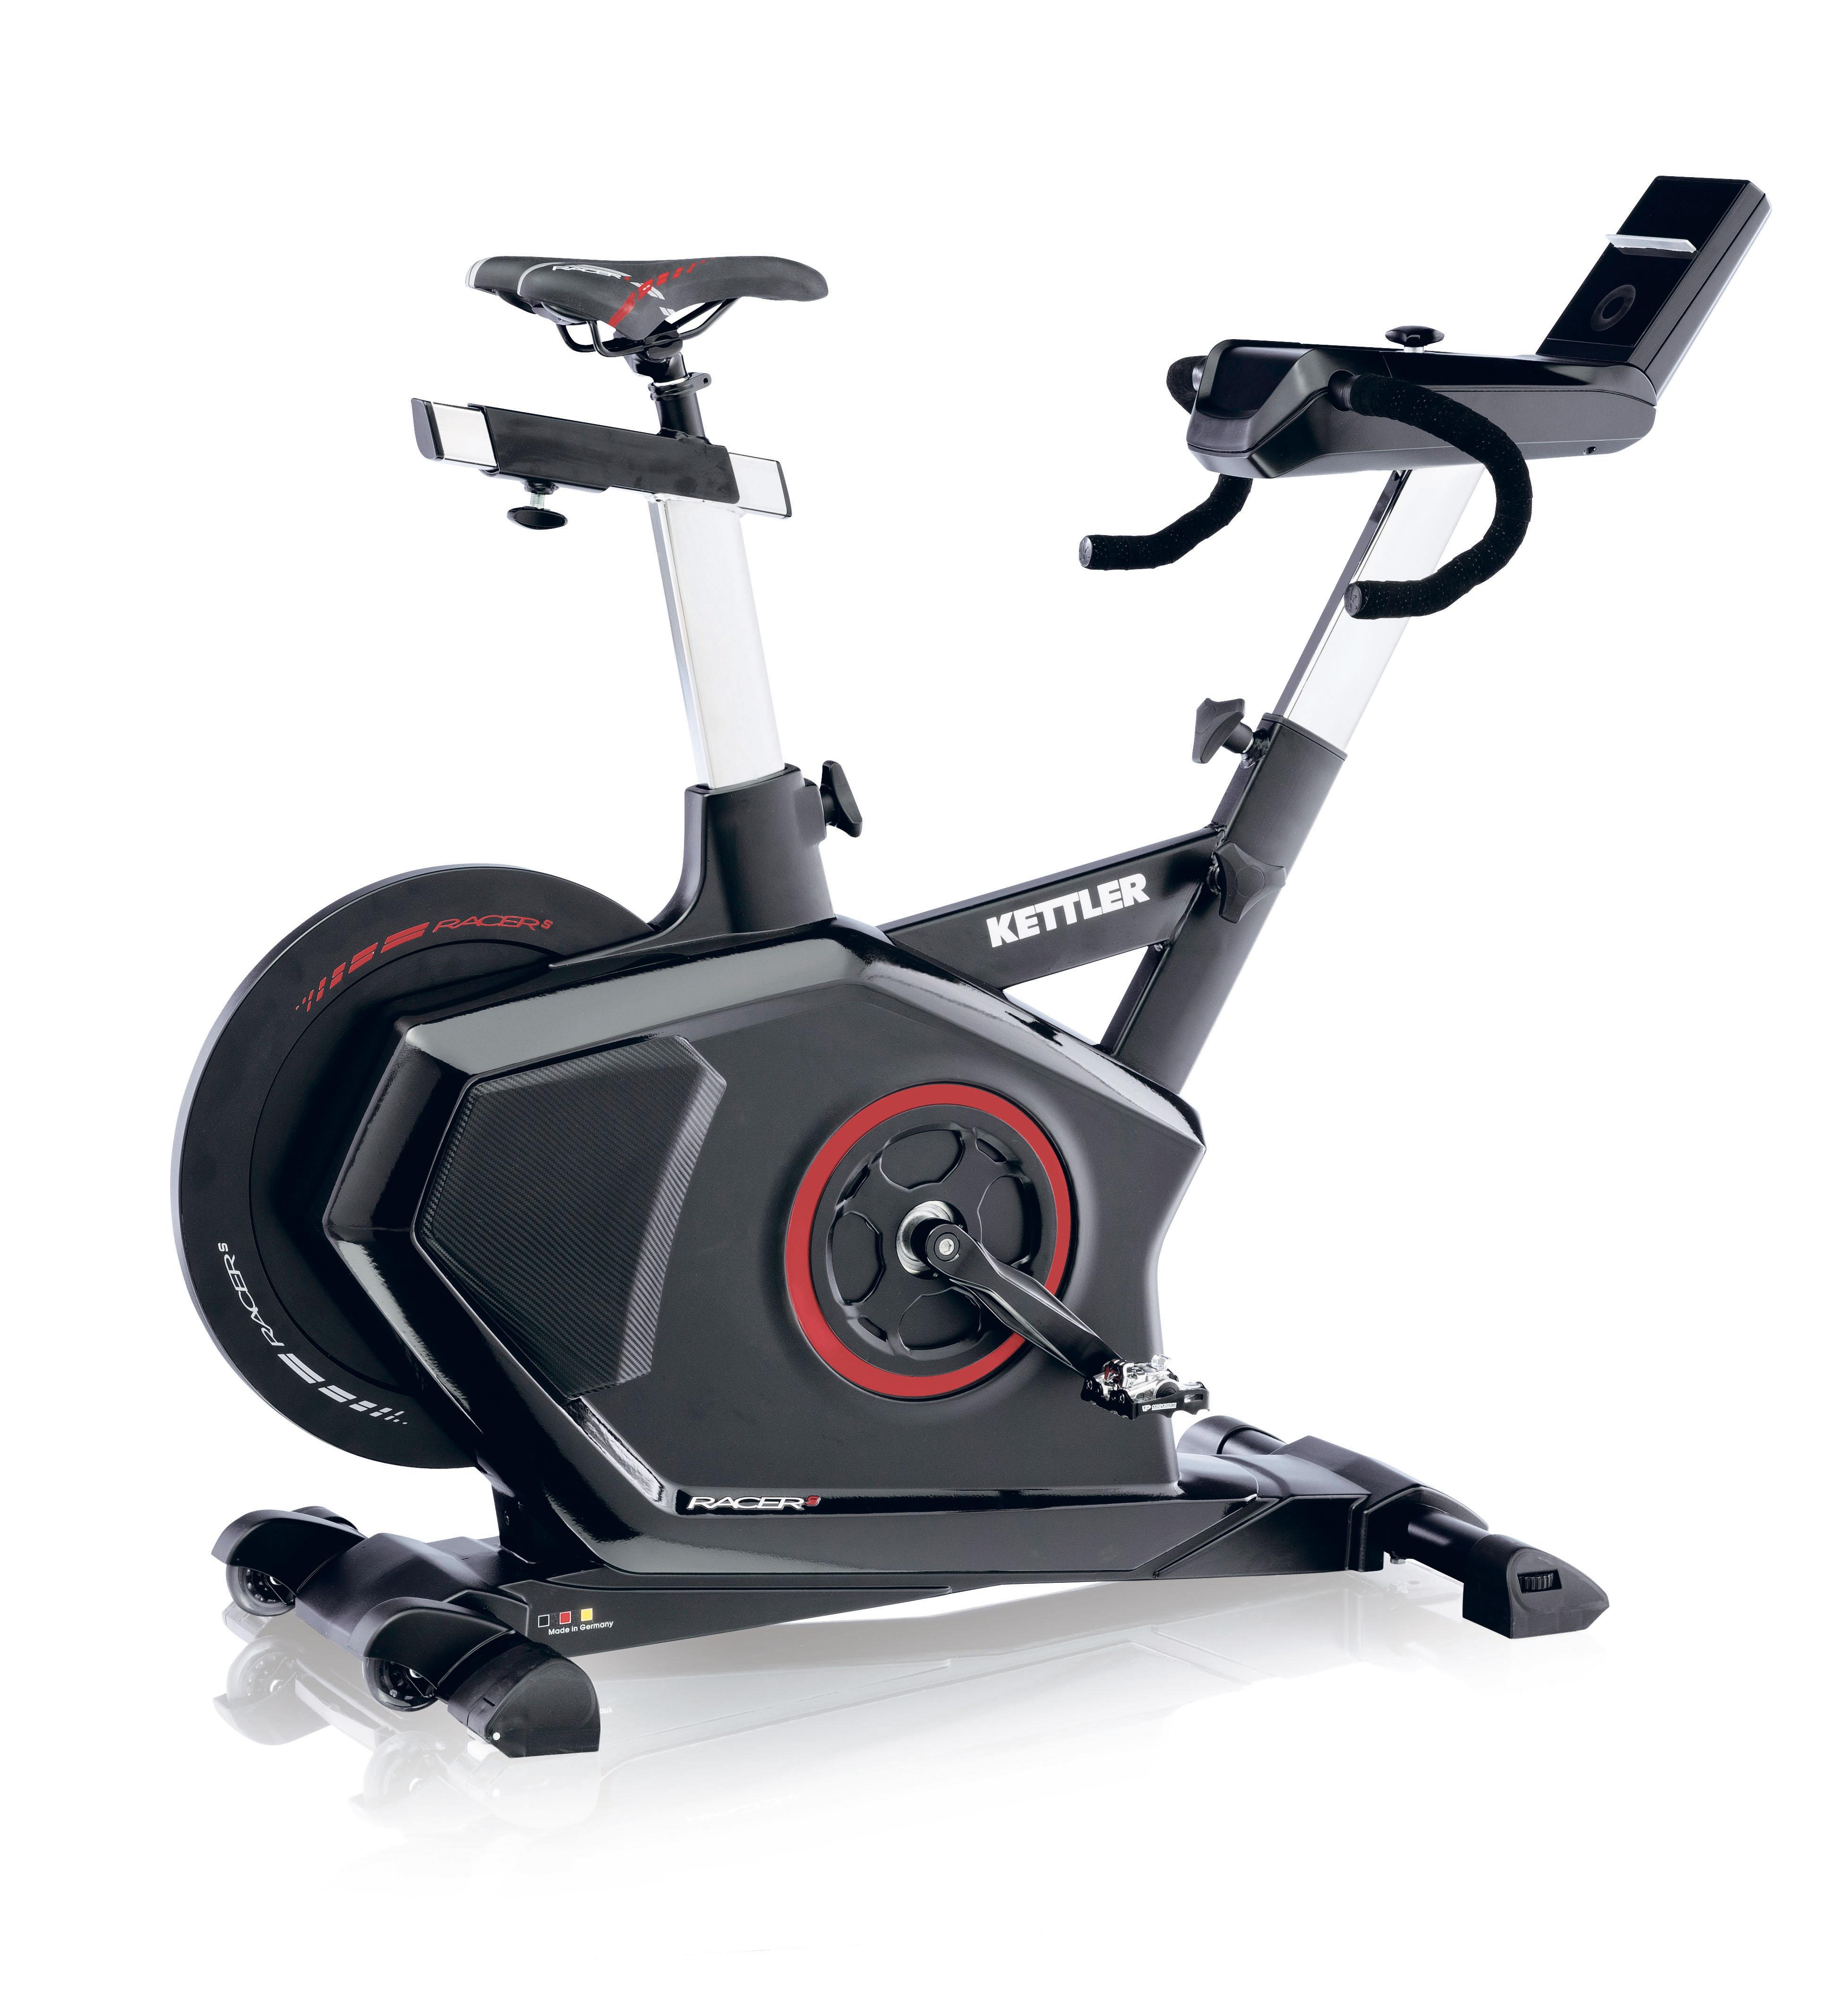 kettler racer s speedbike virtuele hometrainer race en mtb website. Black Bedroom Furniture Sets. Home Design Ideas